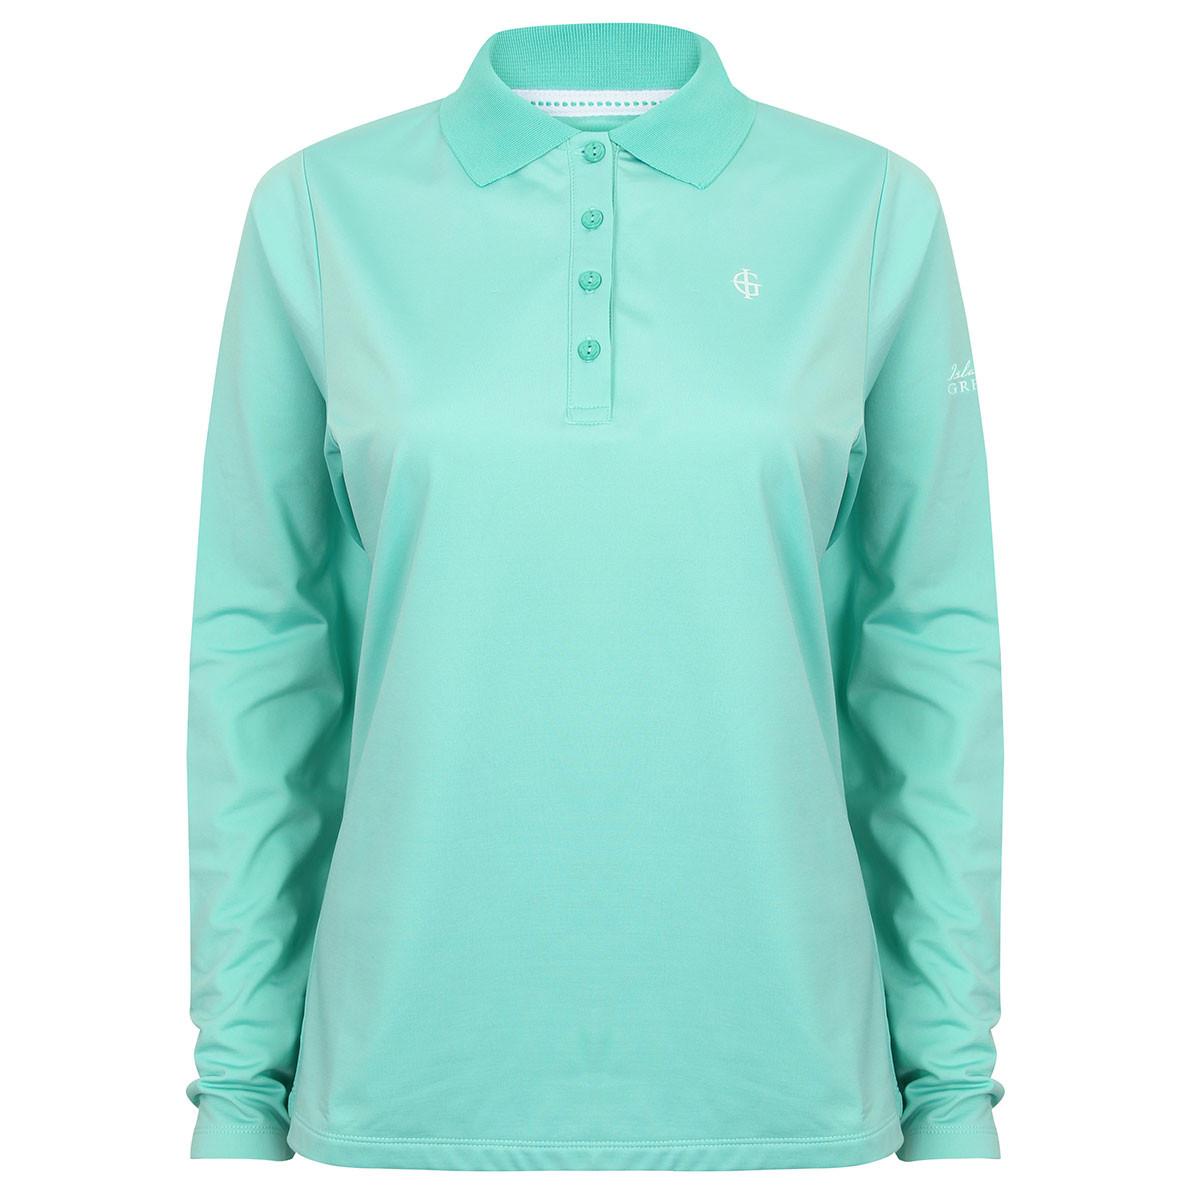 Island Green Ladies Long Sleeve Golf Polo Shirt Golf Polo Shirts